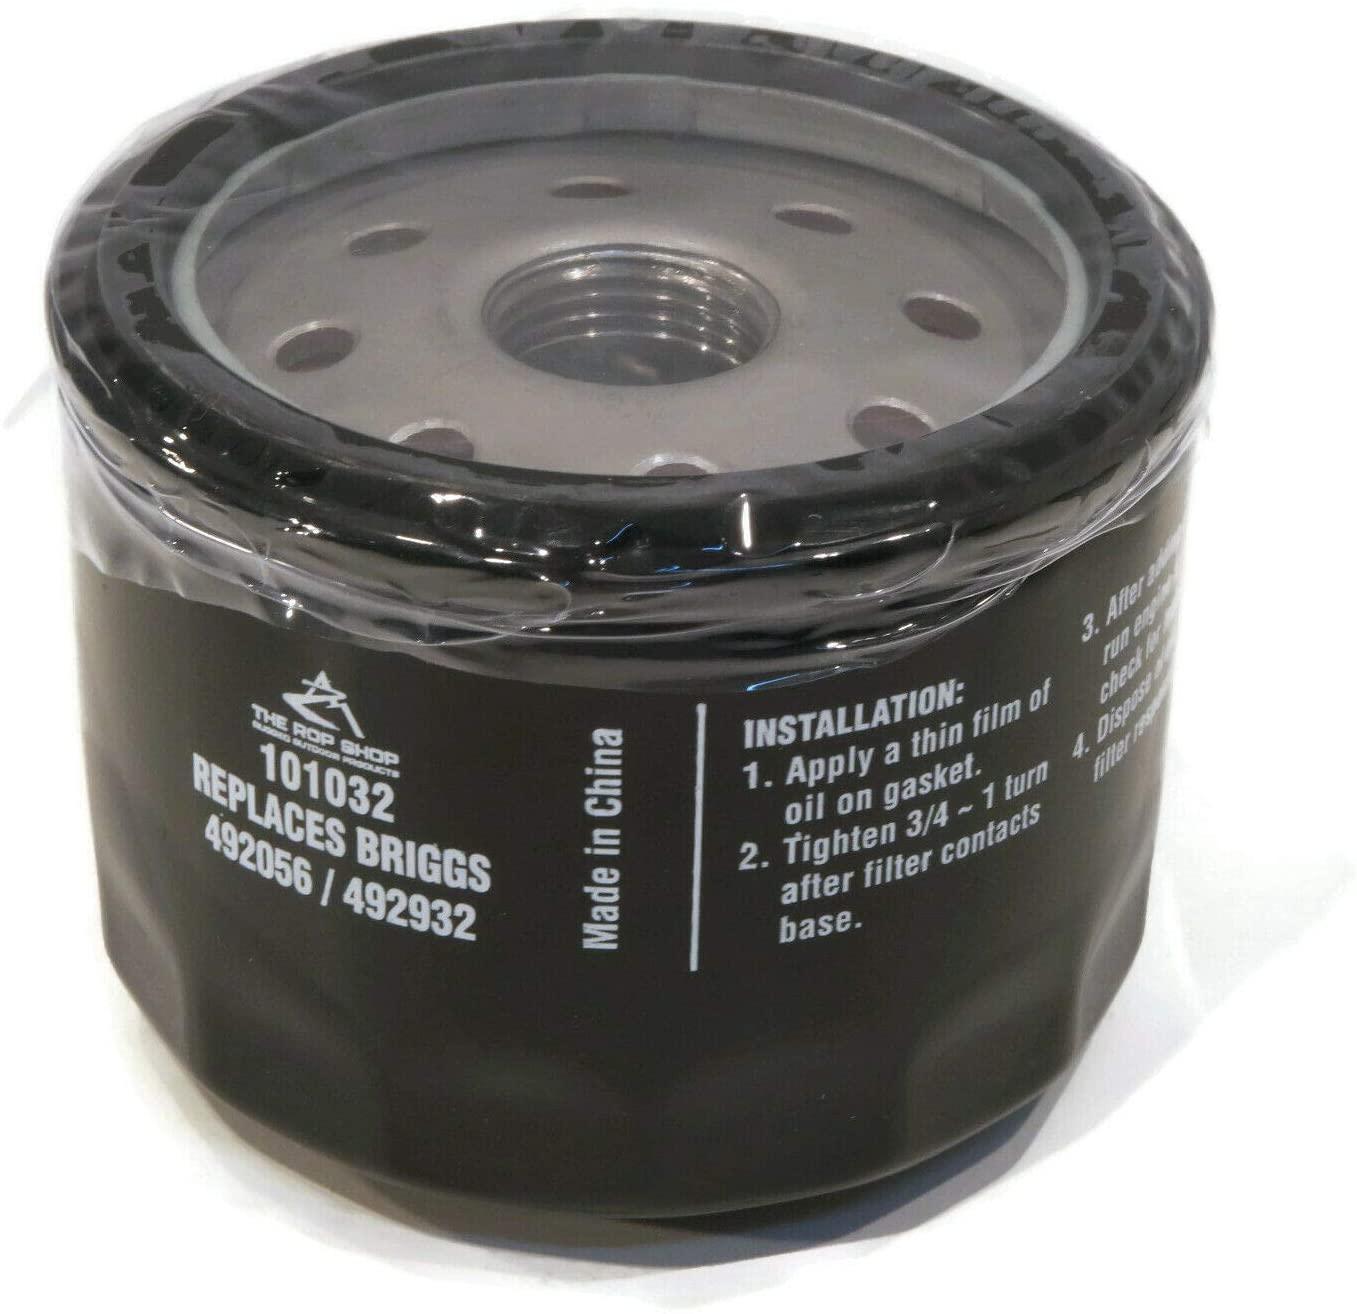 PartsBlast Oil Filter for Briggs & Stratton 492056 5049 5076 - 2 Pack